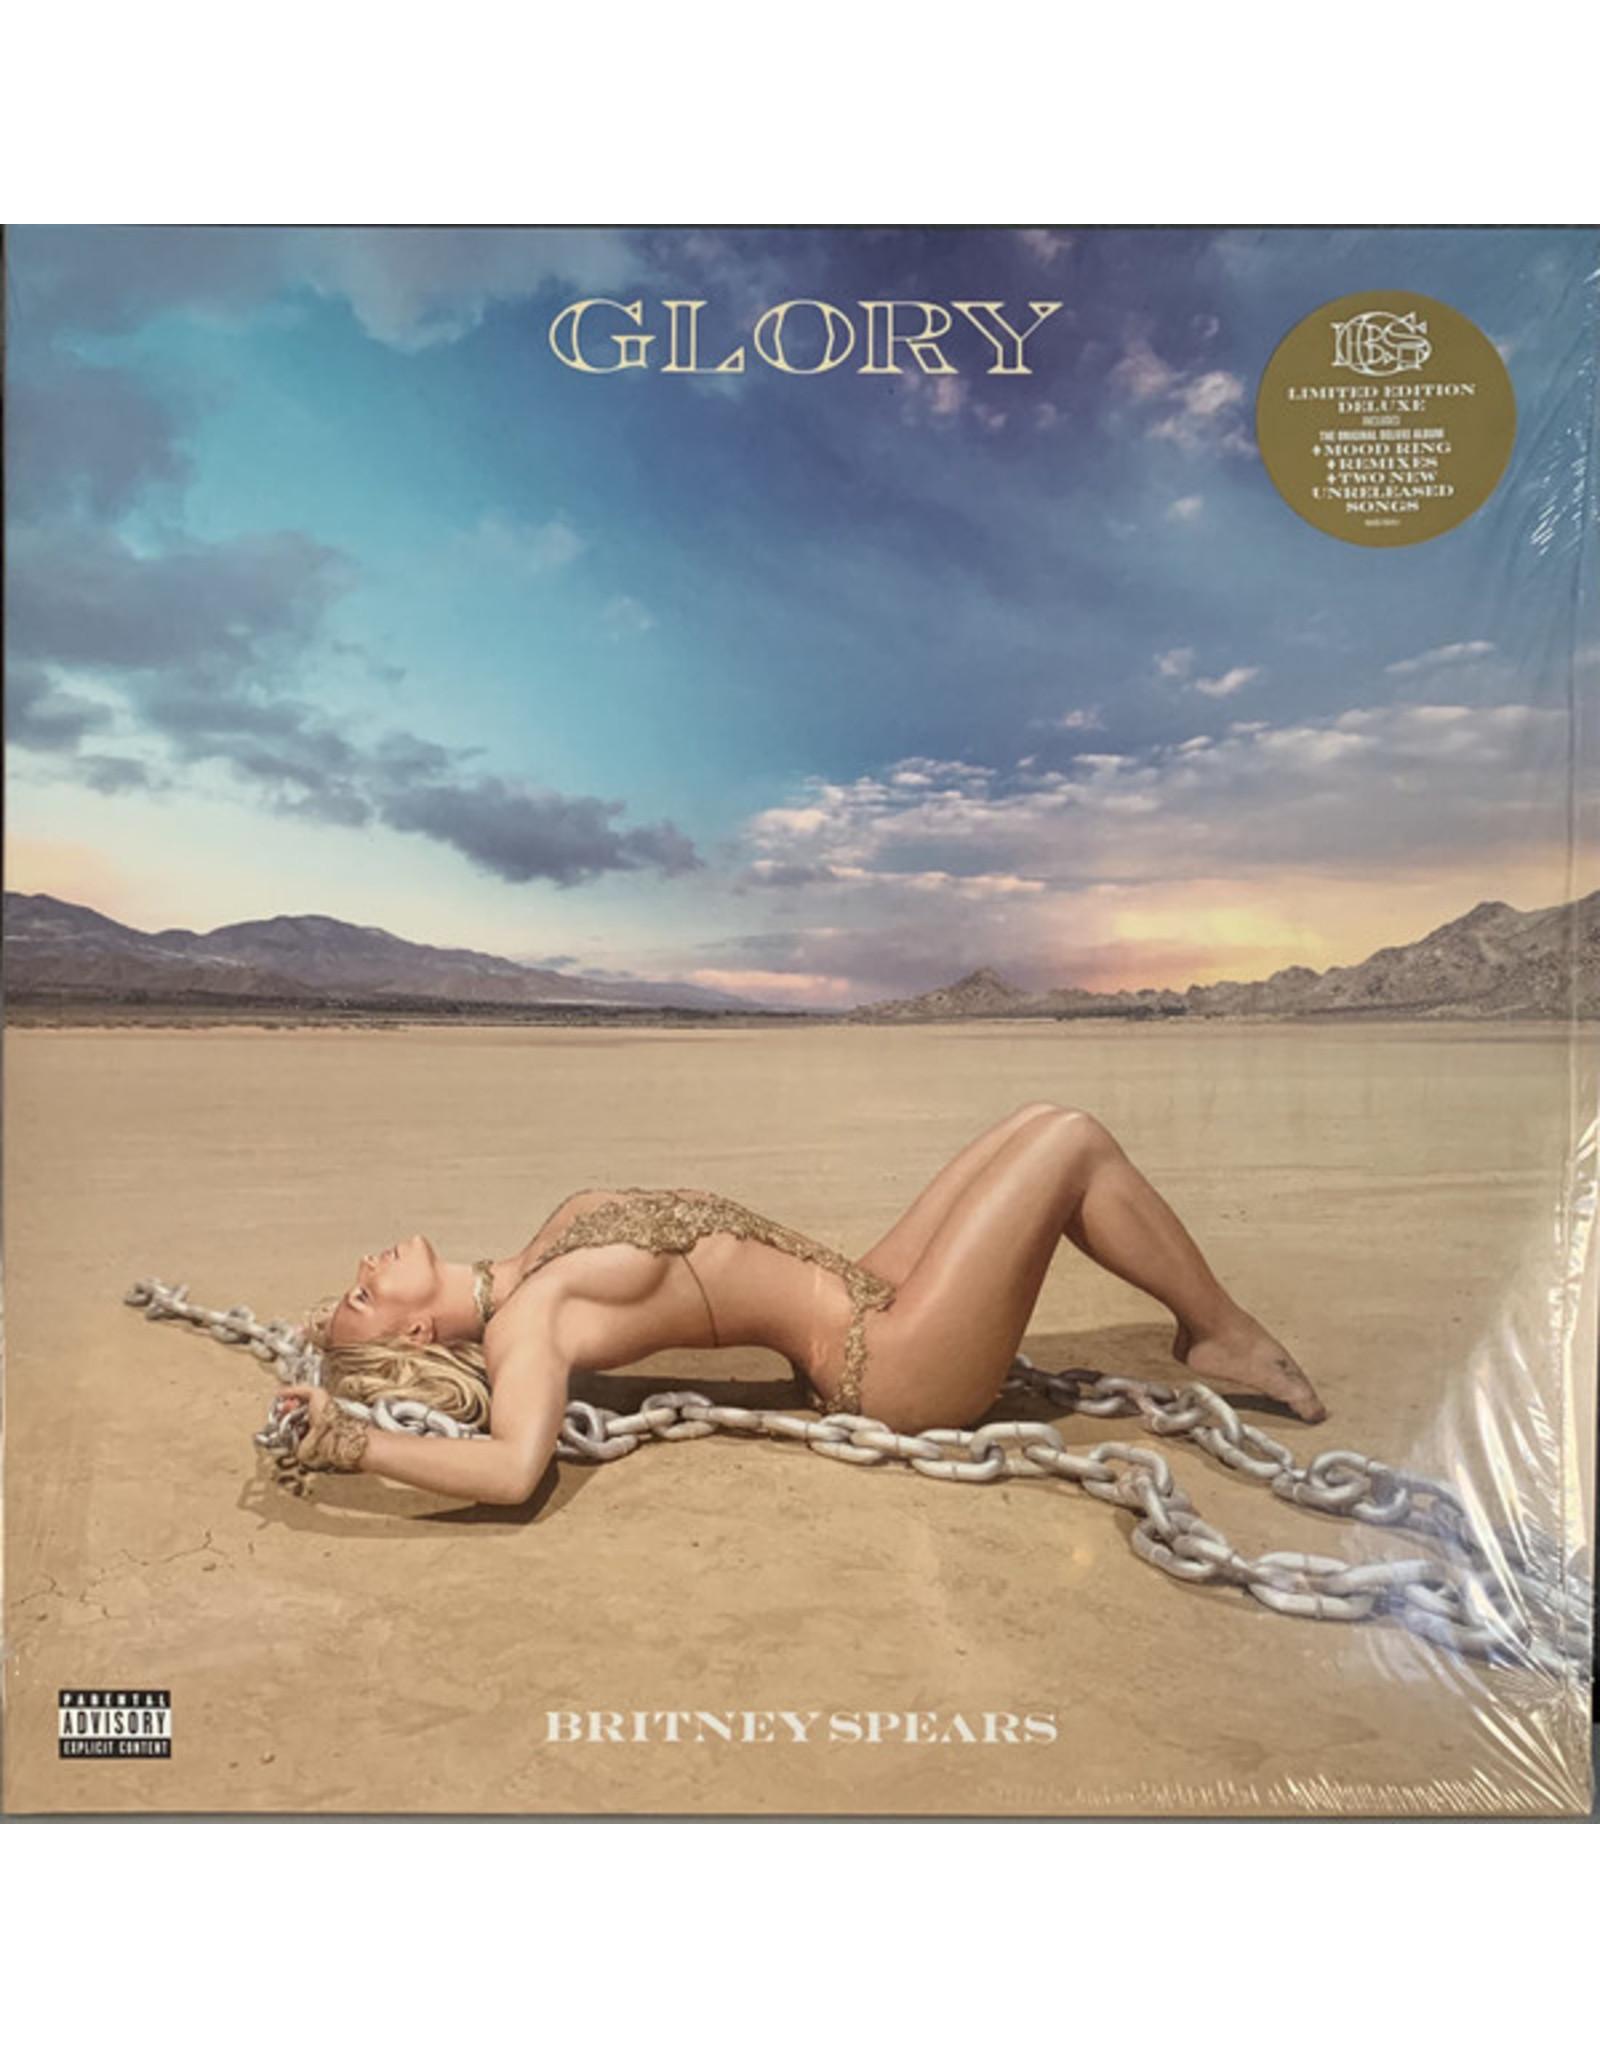 Britney Spears - Glory (2020 Version) [White Vinyl]